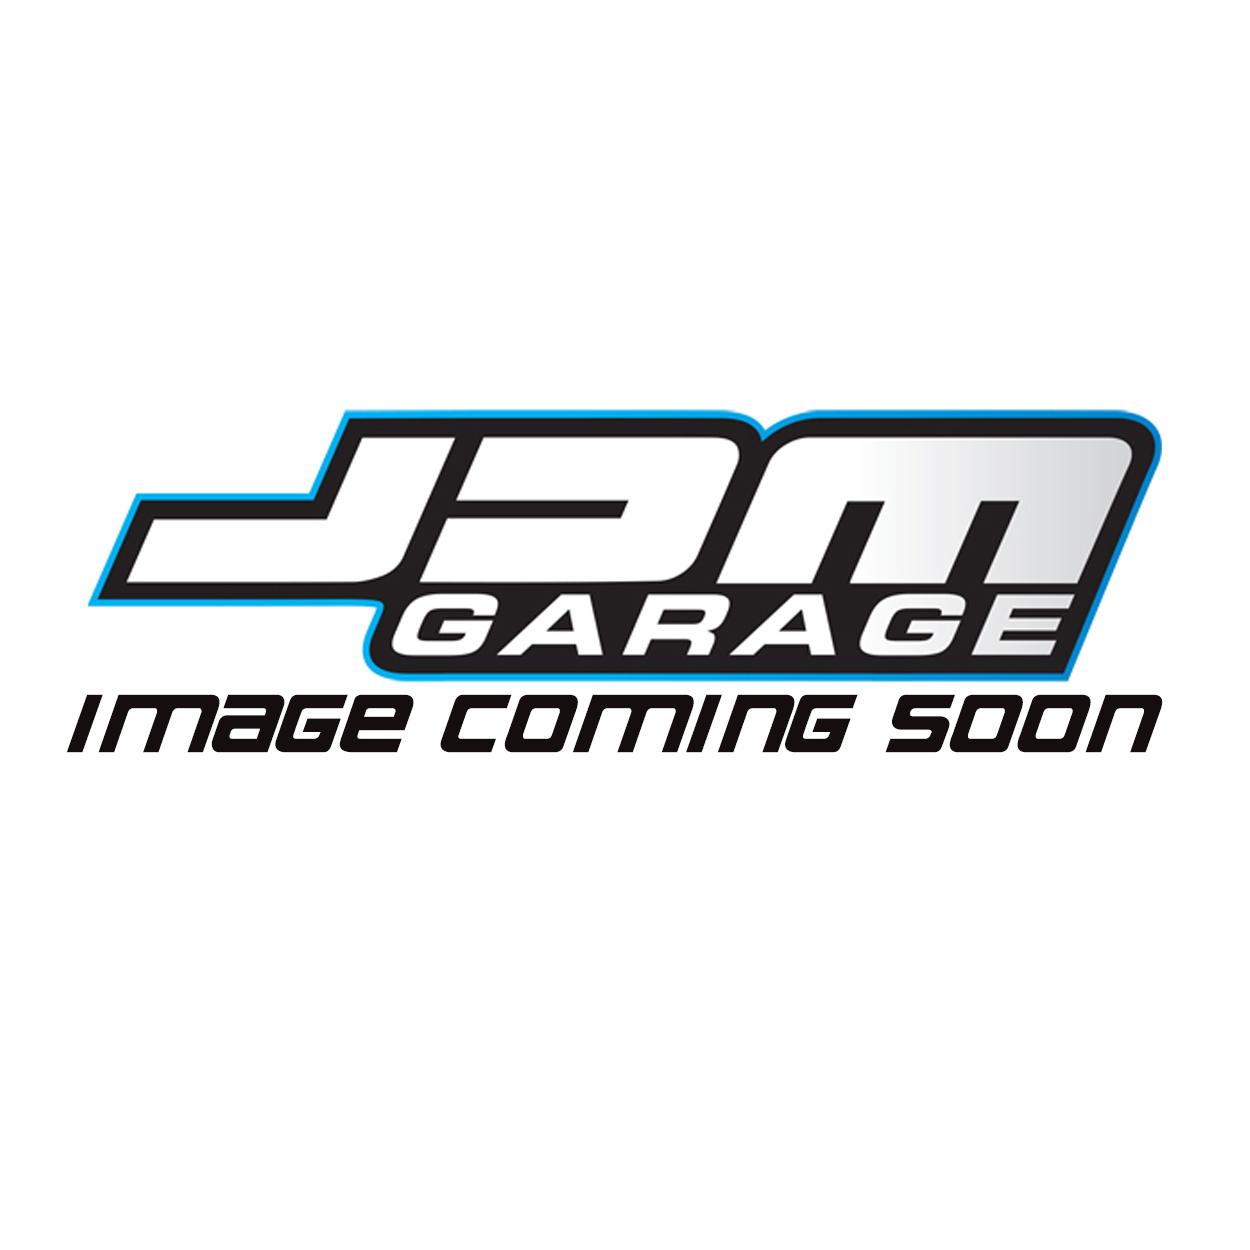 Tomei ARMS Turbocharger Kit 650HP MX8260 For Nissan Skyline R32 R33 R34 GT-R RB26DETT TB401A-NS05B